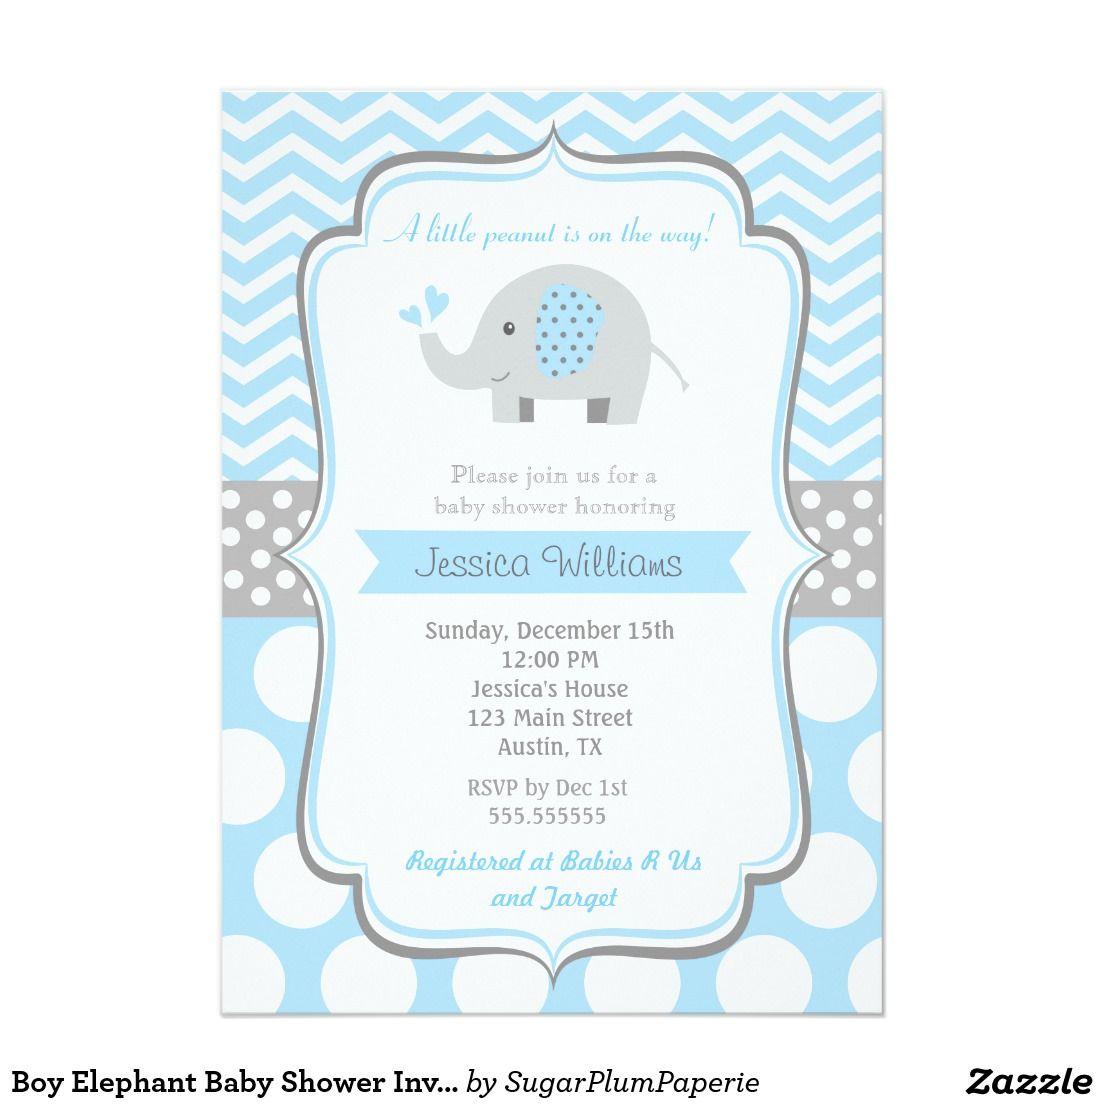 Boy Elephant Baby Shower Invitations Zazzle Com Baby Shower